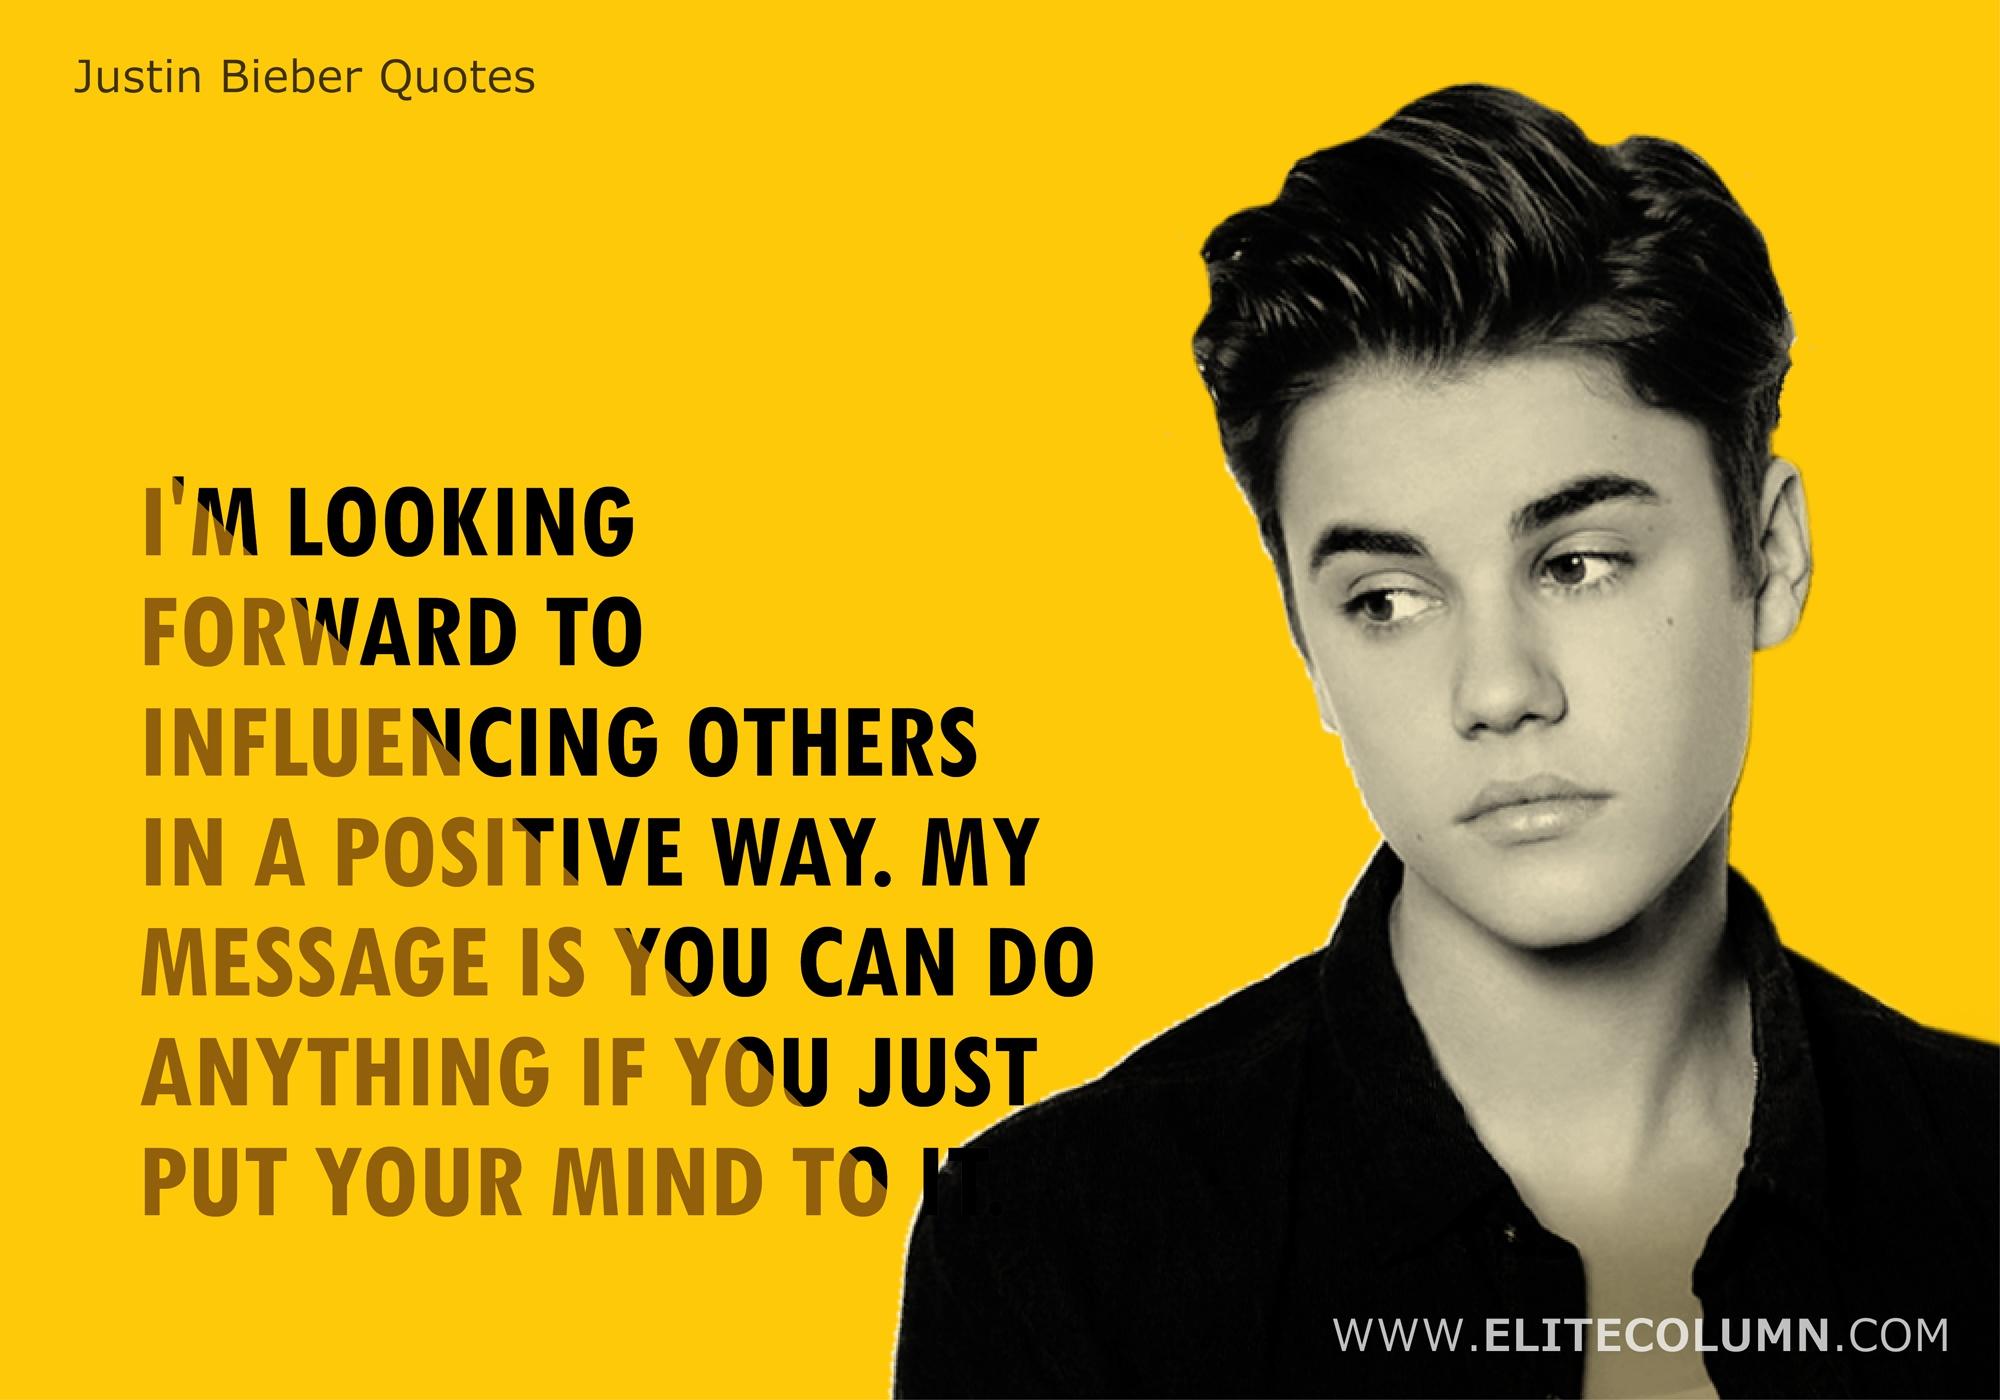 Justin Bieber Quotes (8)